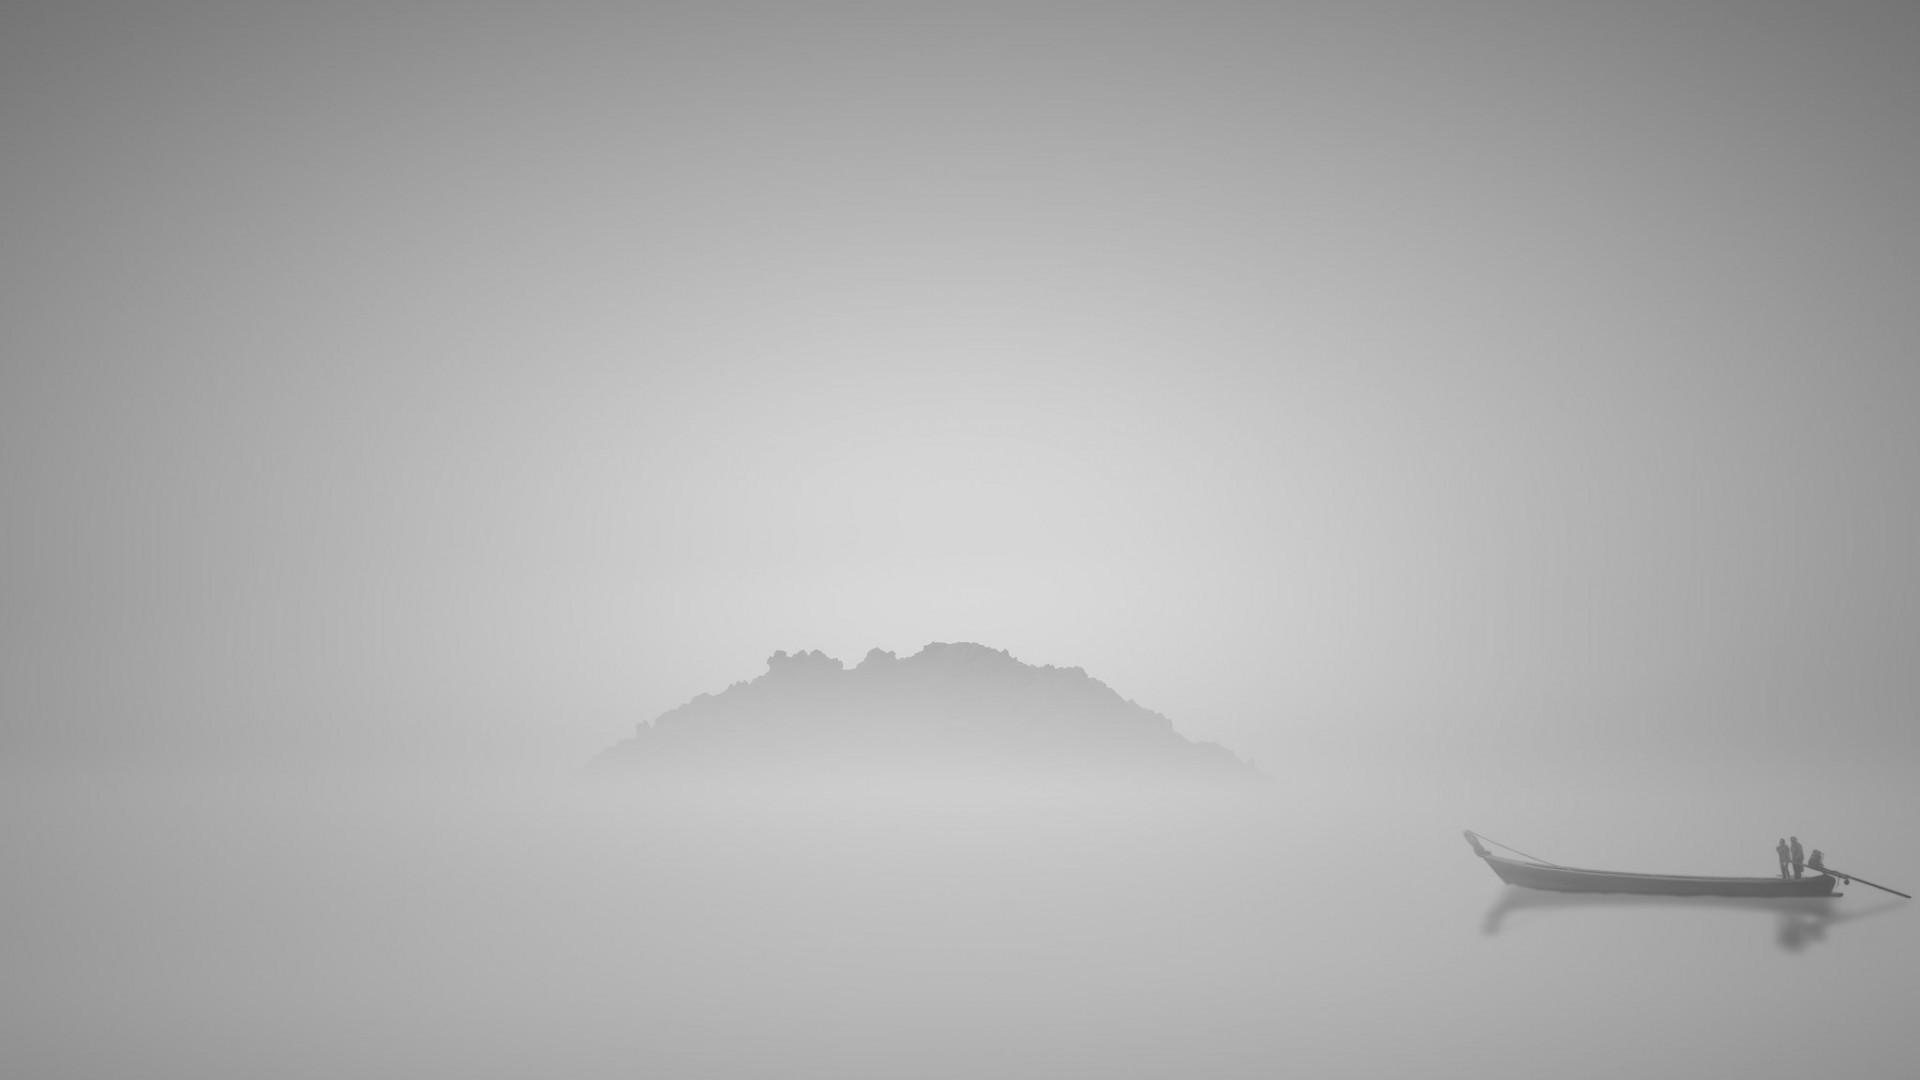 Japanese Wave Wallpaper Hd Nature Landscape Water Lake Hill Mist Boat People